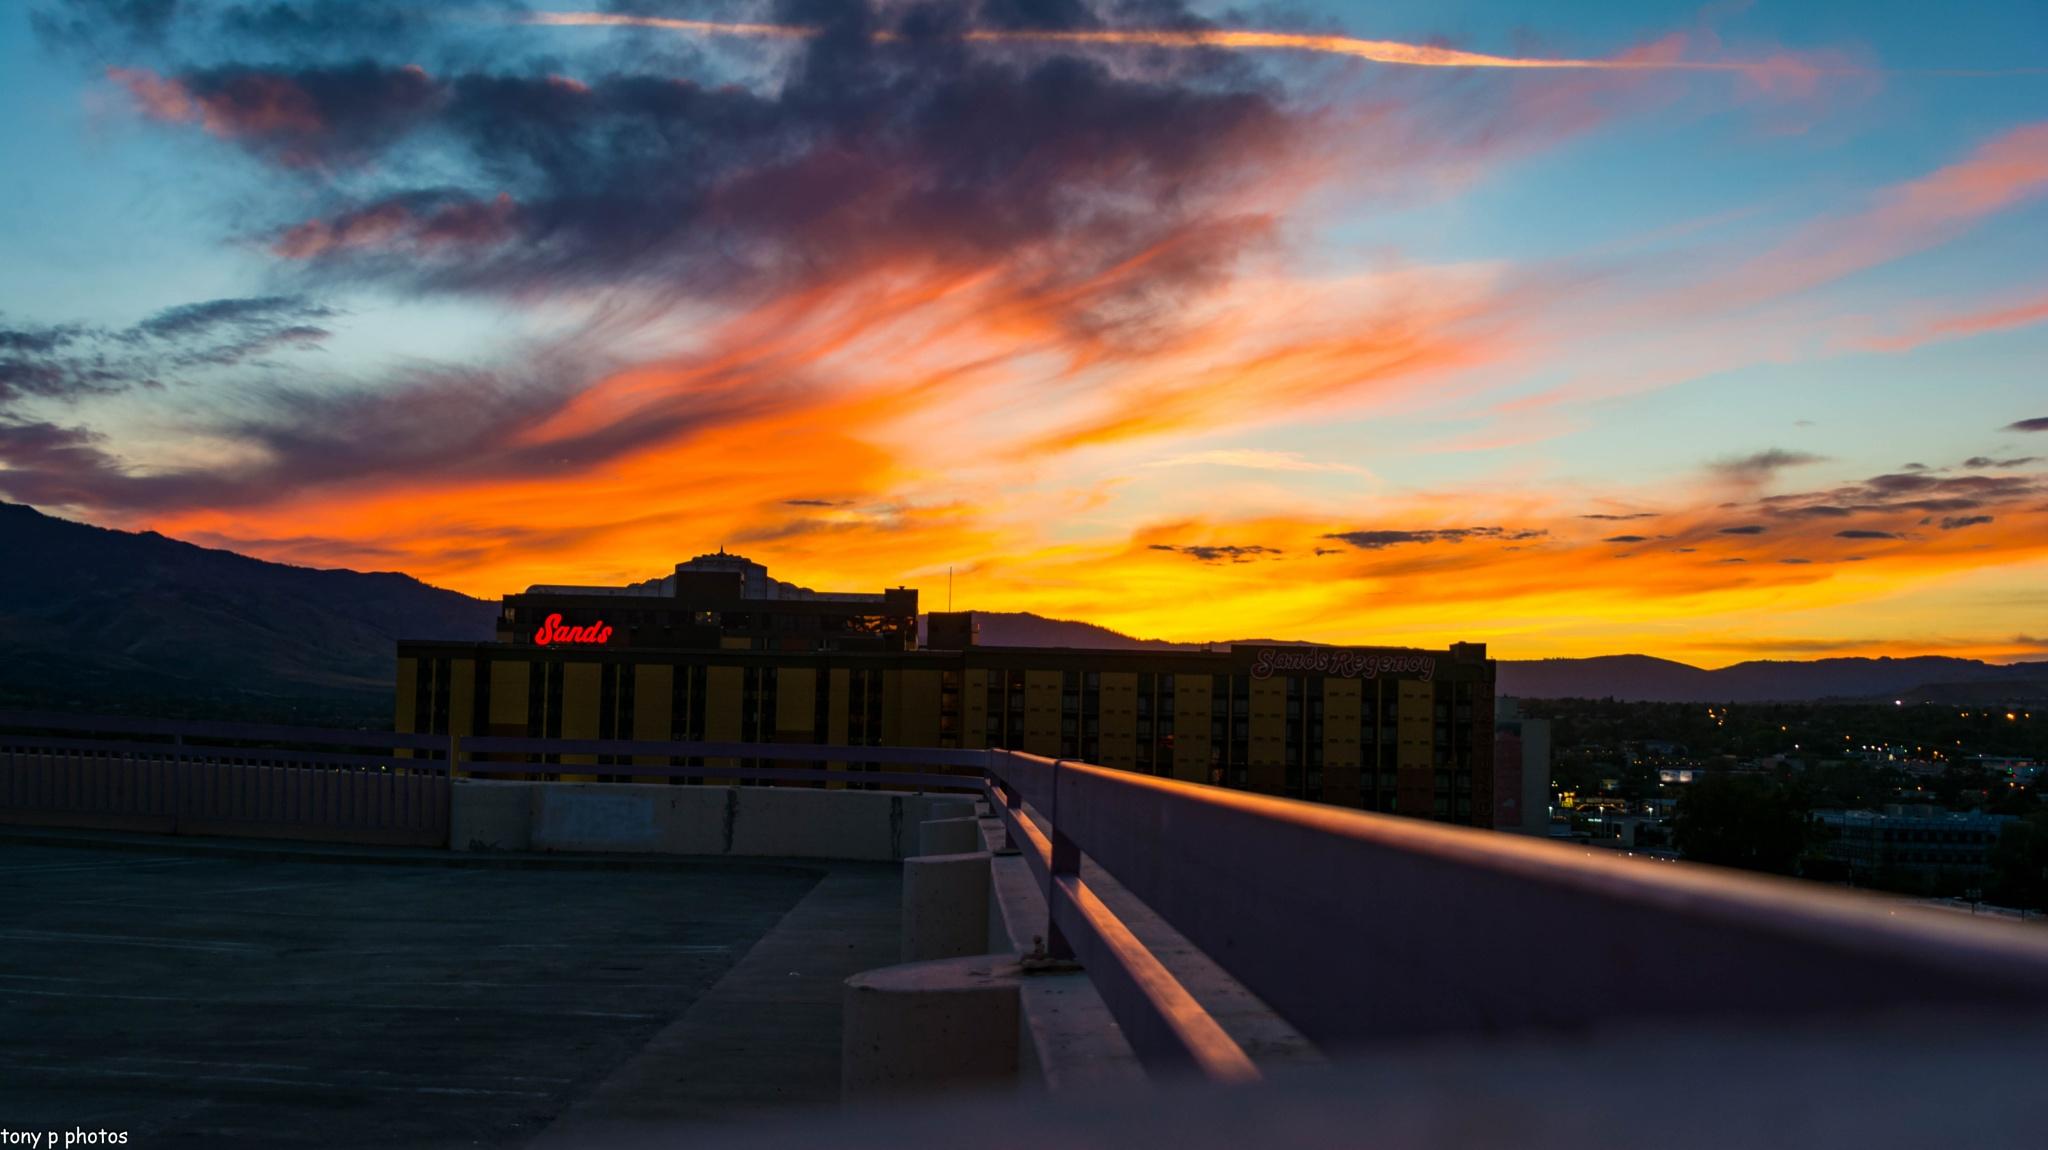 Sunset over the Sands by klarkaston